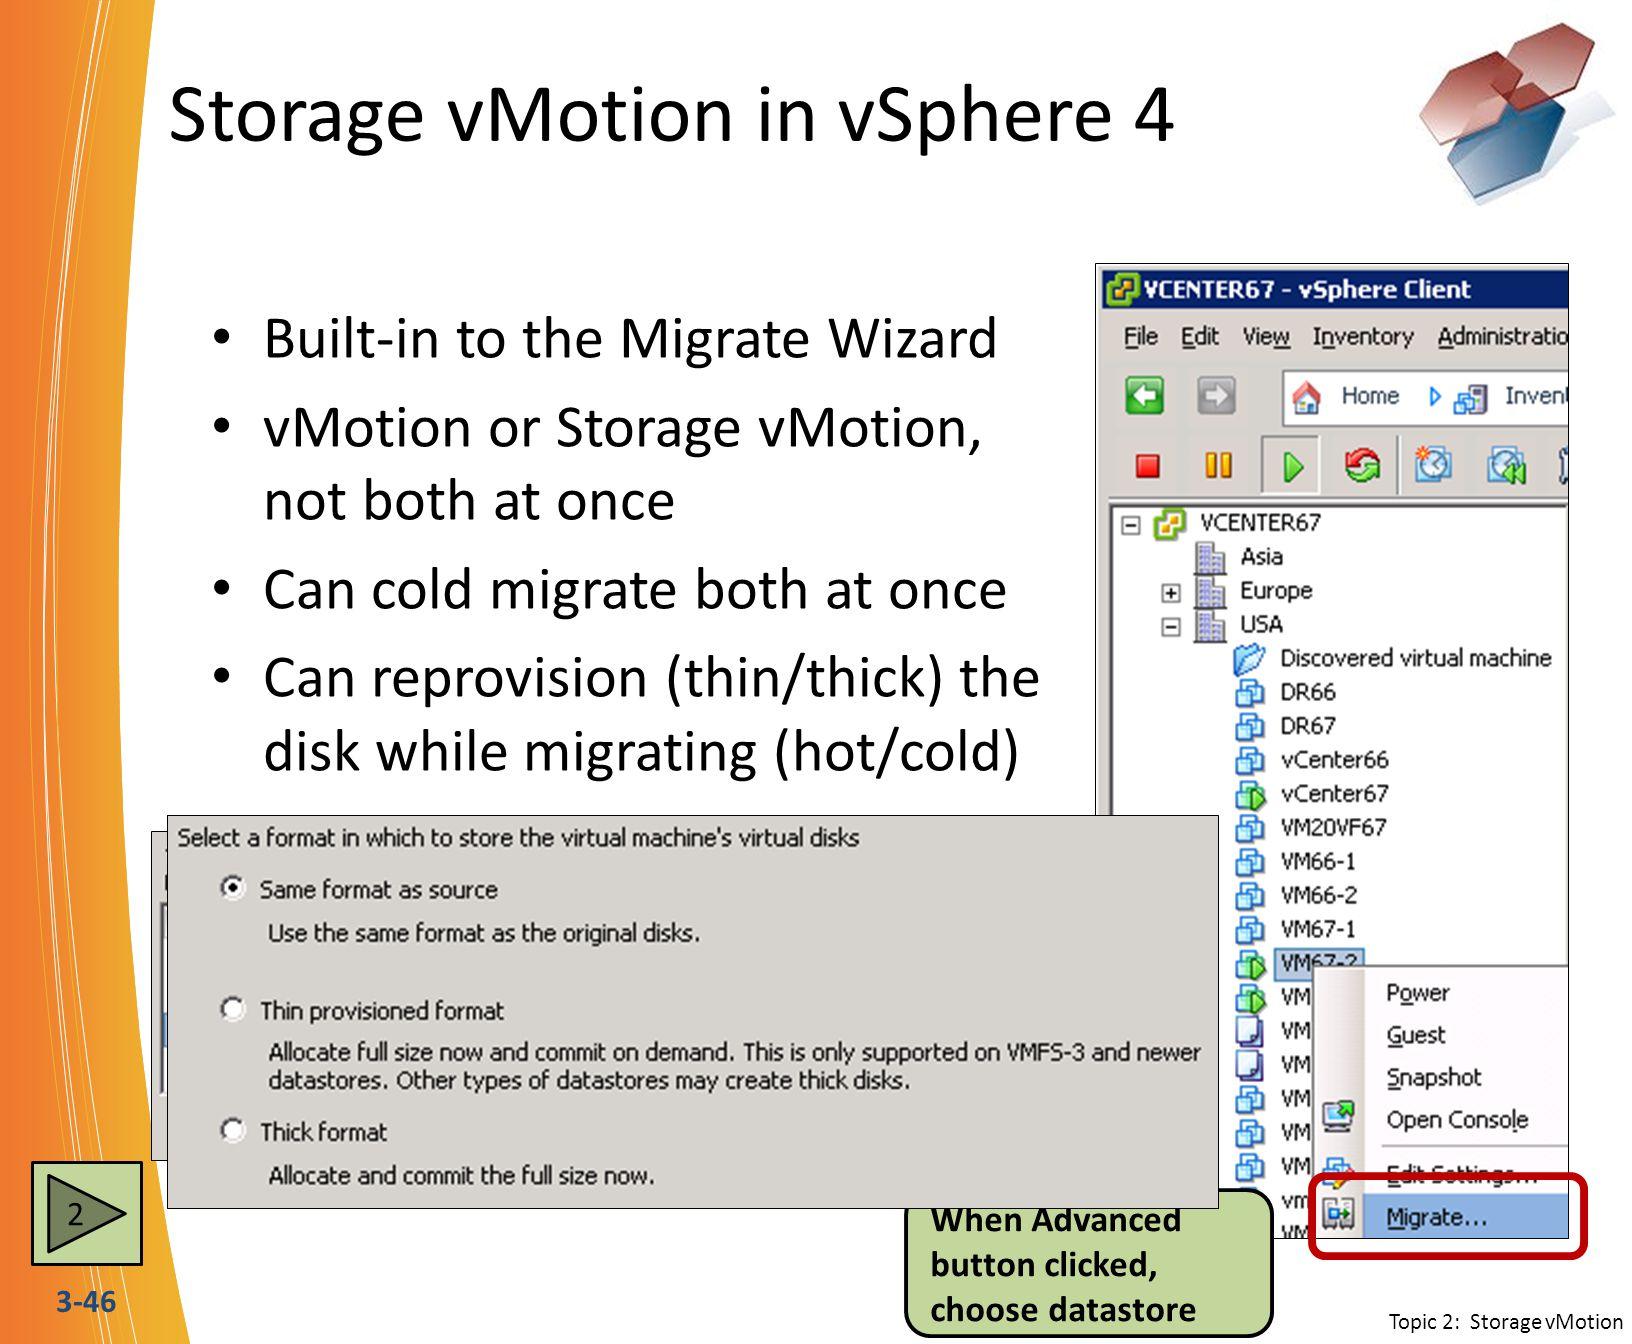 Storage vMotion in vSphere 4